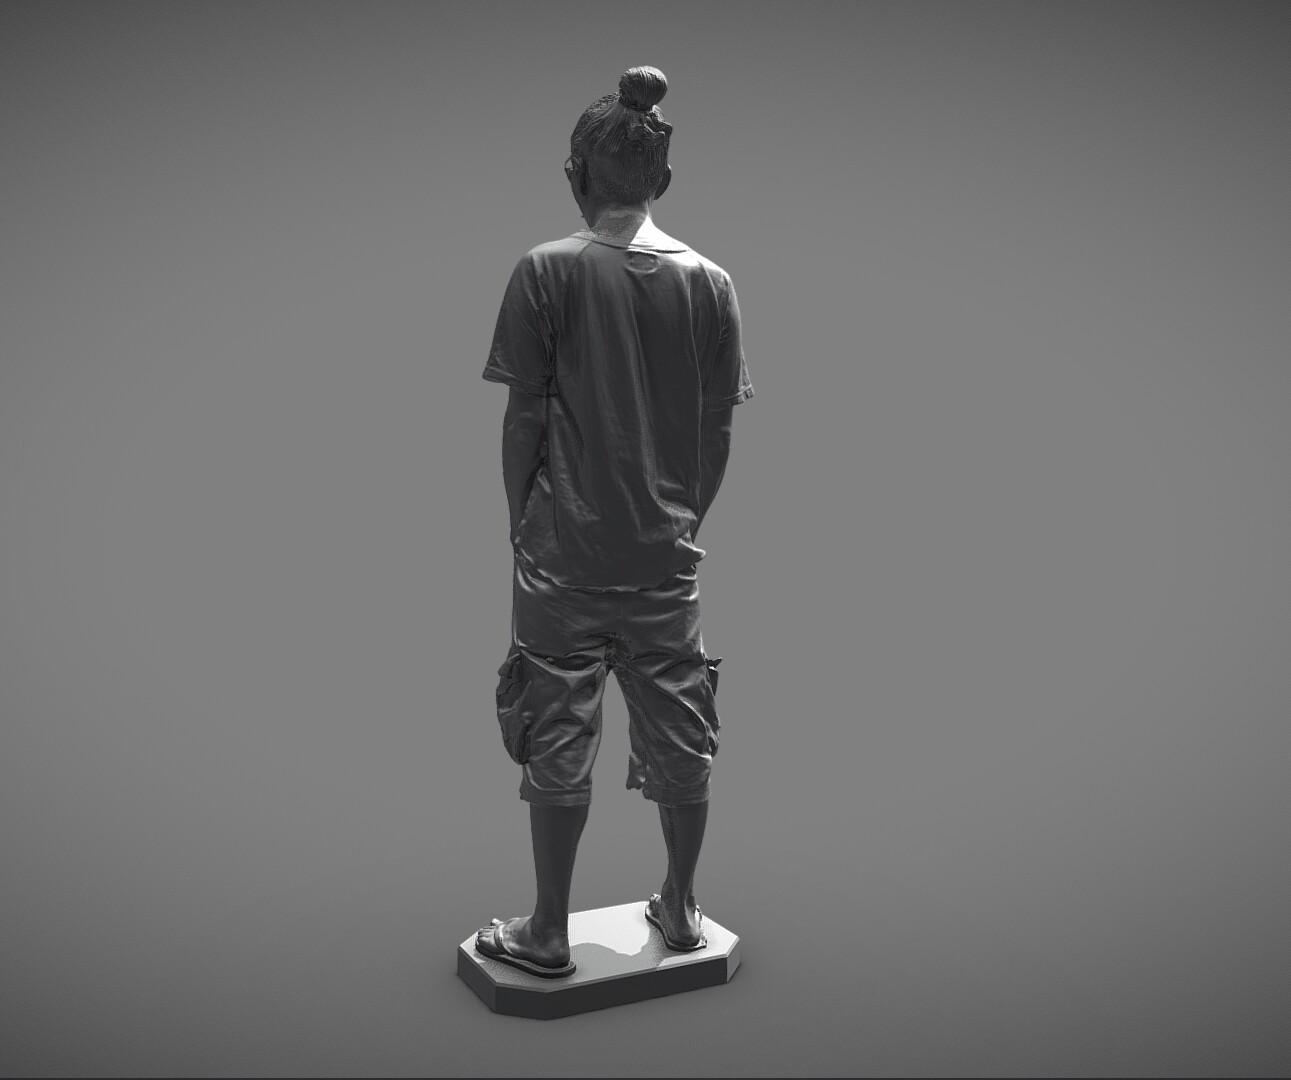 Michael wu 3d models by mwopus mwopus sketchfab20190320 007963